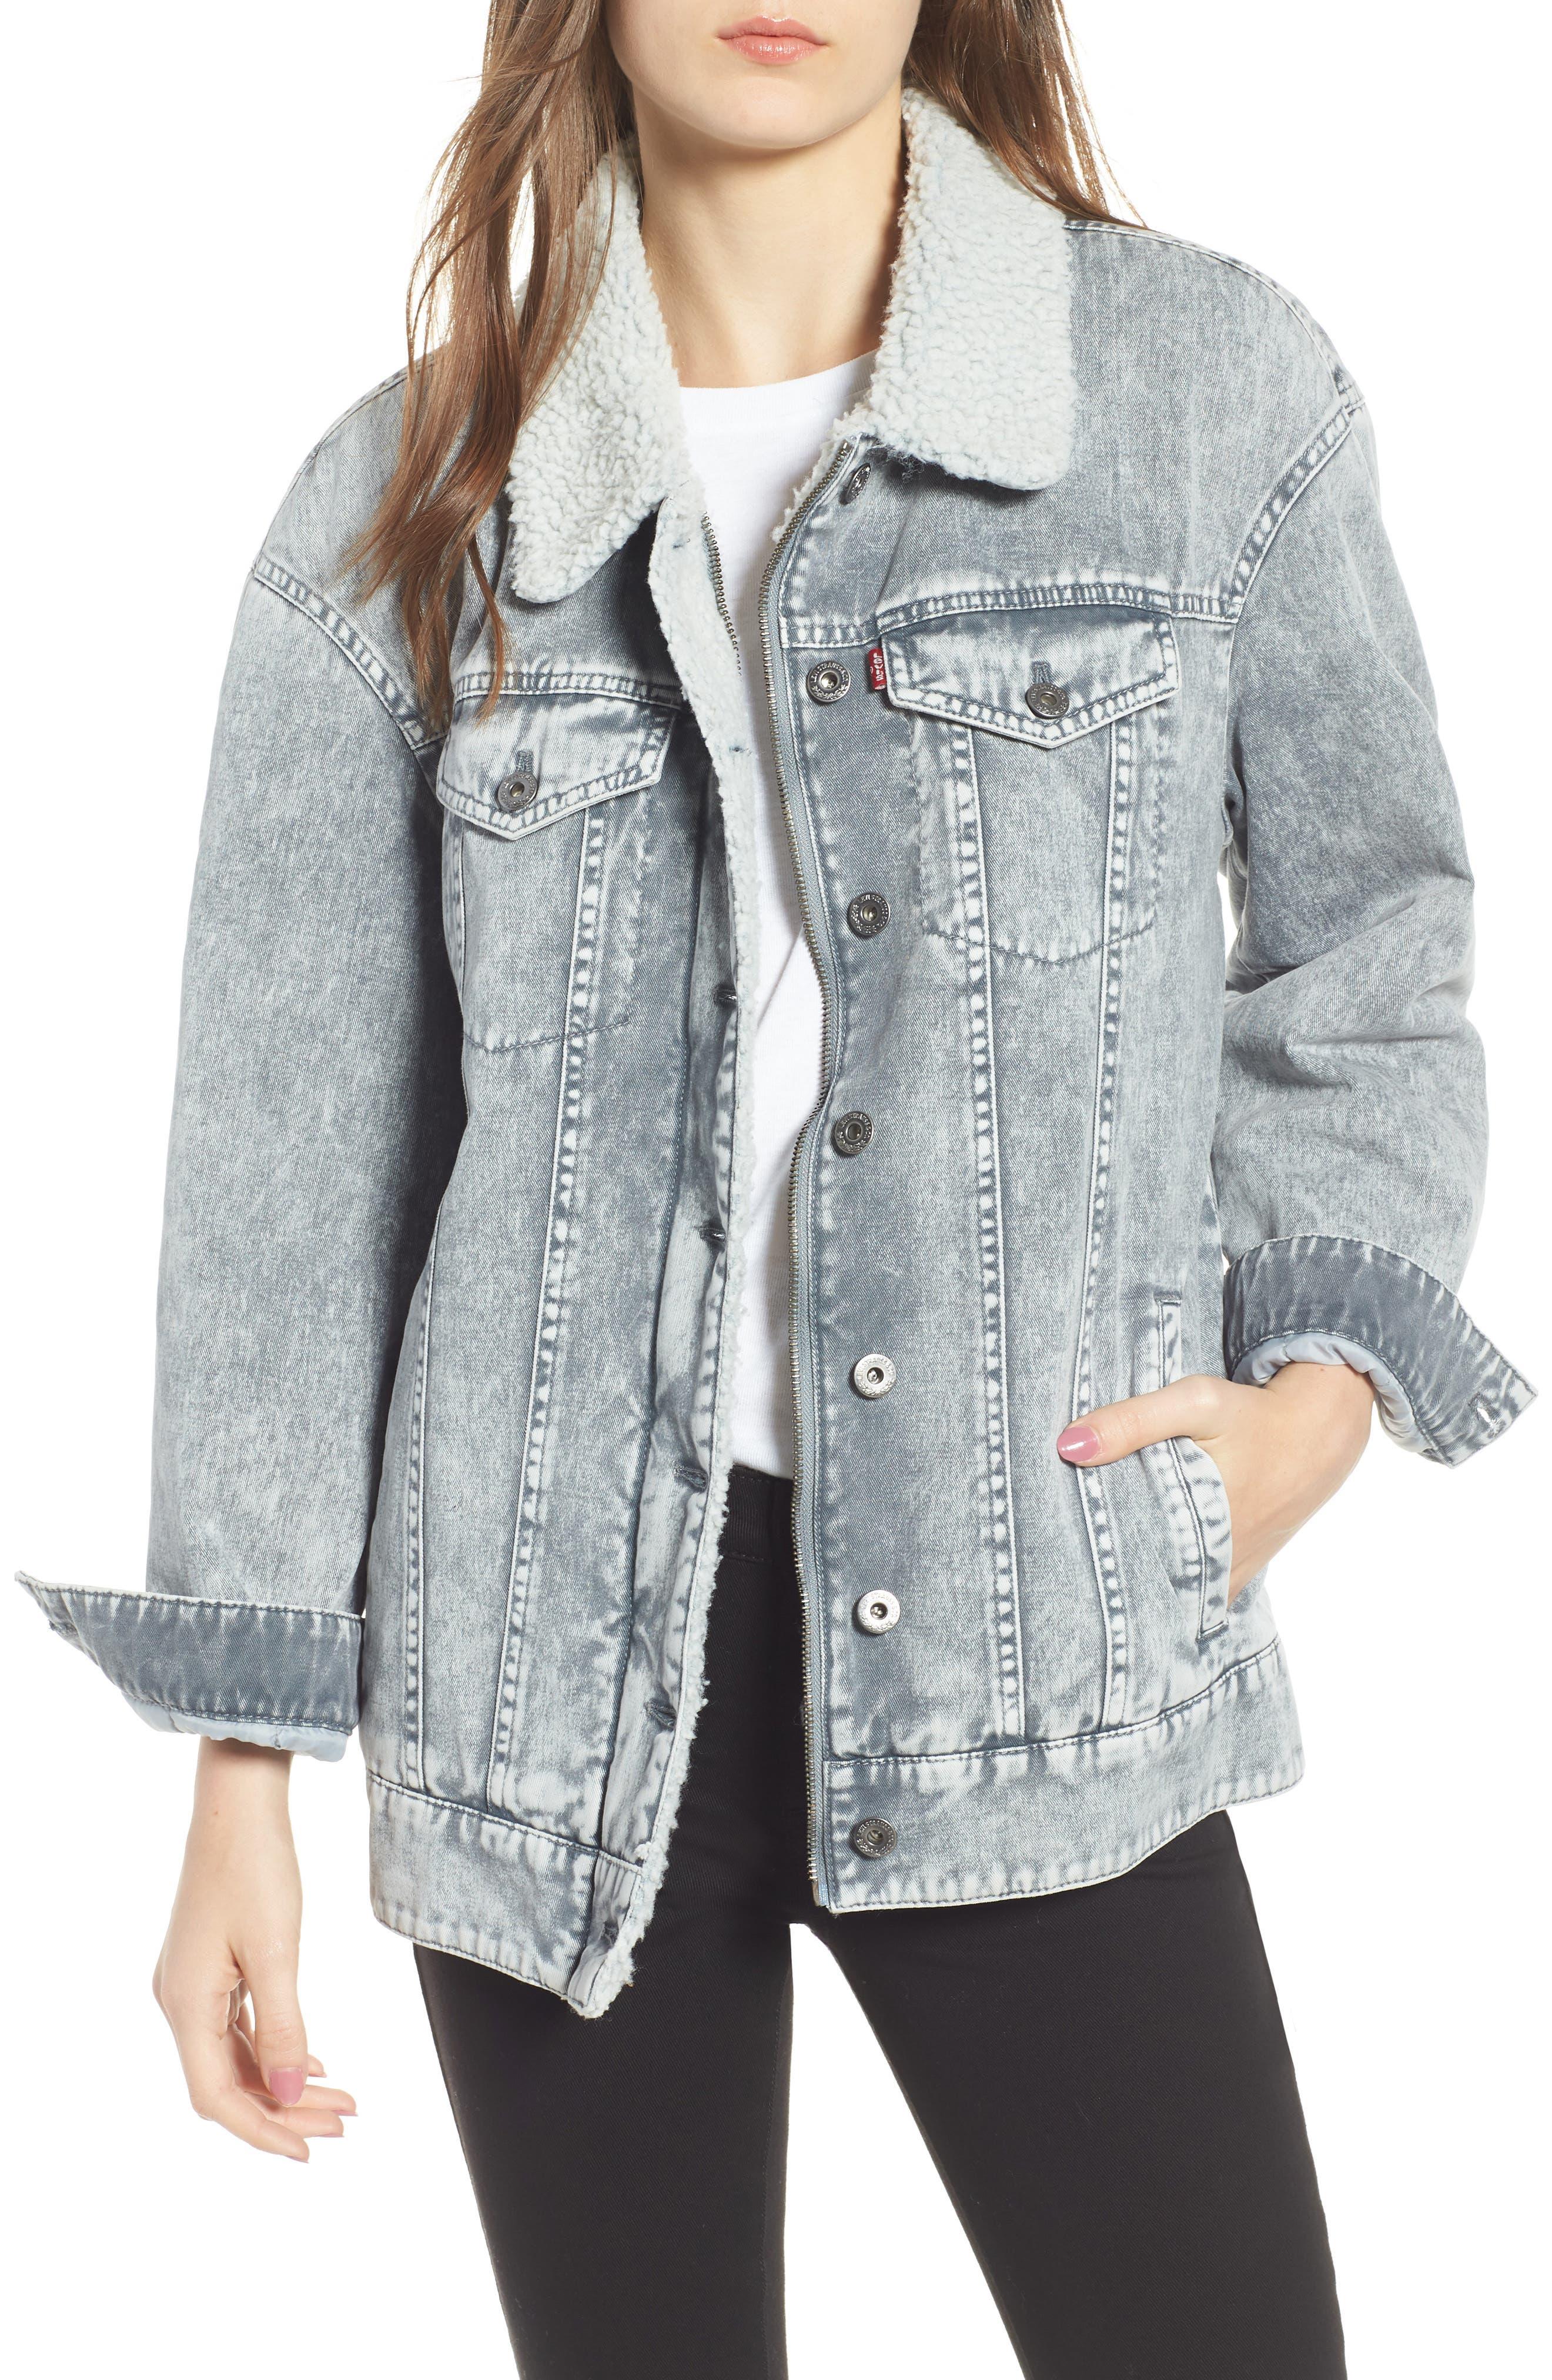 Levi's<sup>®</sup> Oversize Denim Trucker Jacket,                             Main thumbnail 1, color,                             GREY